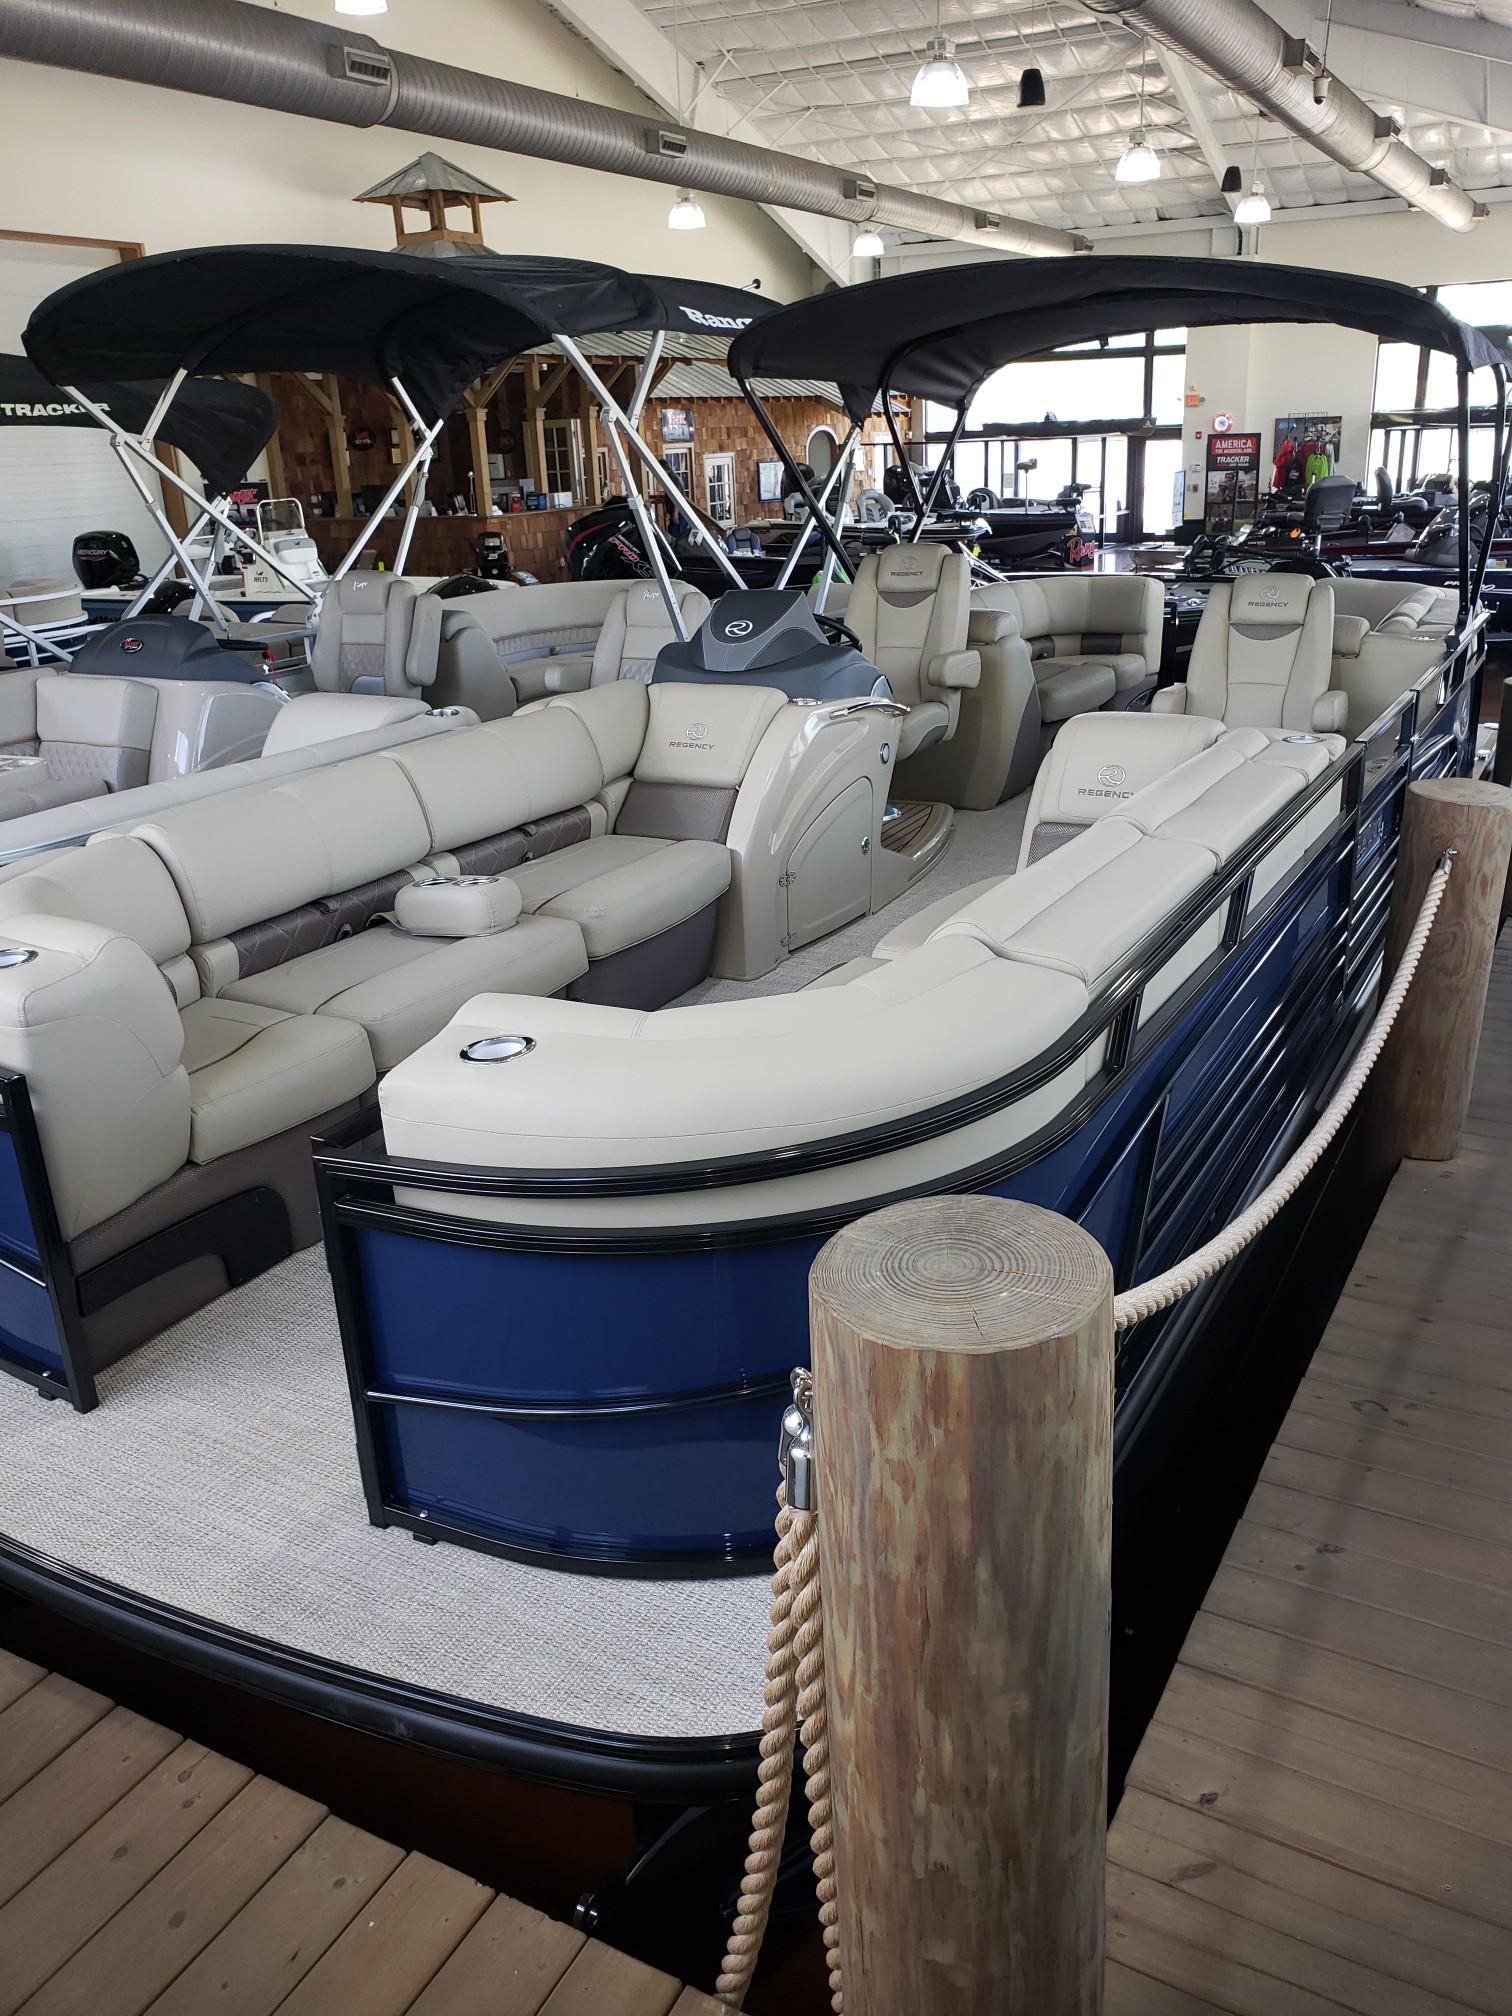 2020 Regency boat for sale, model of the boat is 250 LE3 w/300L Verado & Image # 25 of 27